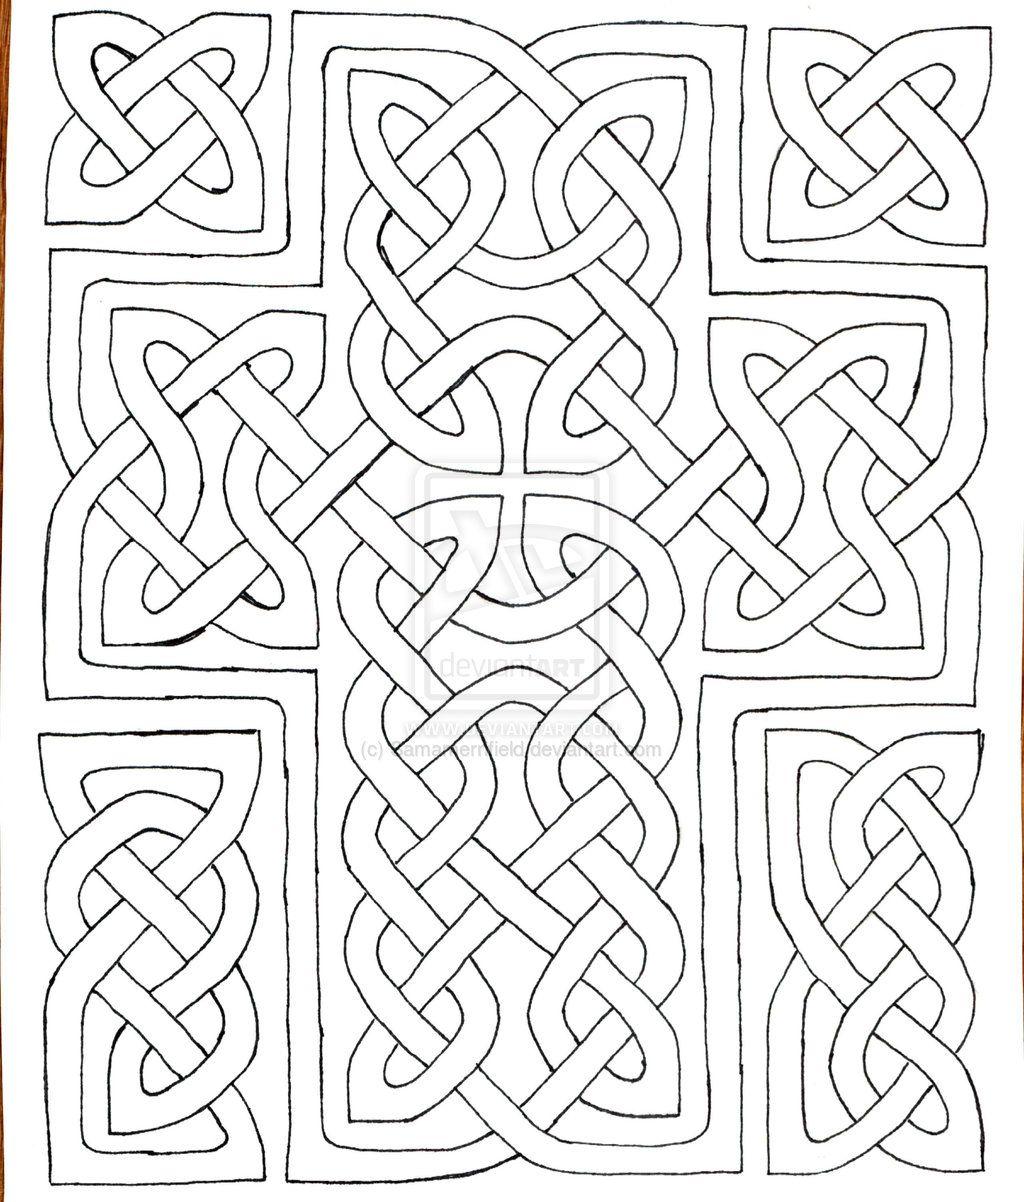 celtic Coloring Pages - Bing Images | Color pages | Pinterest